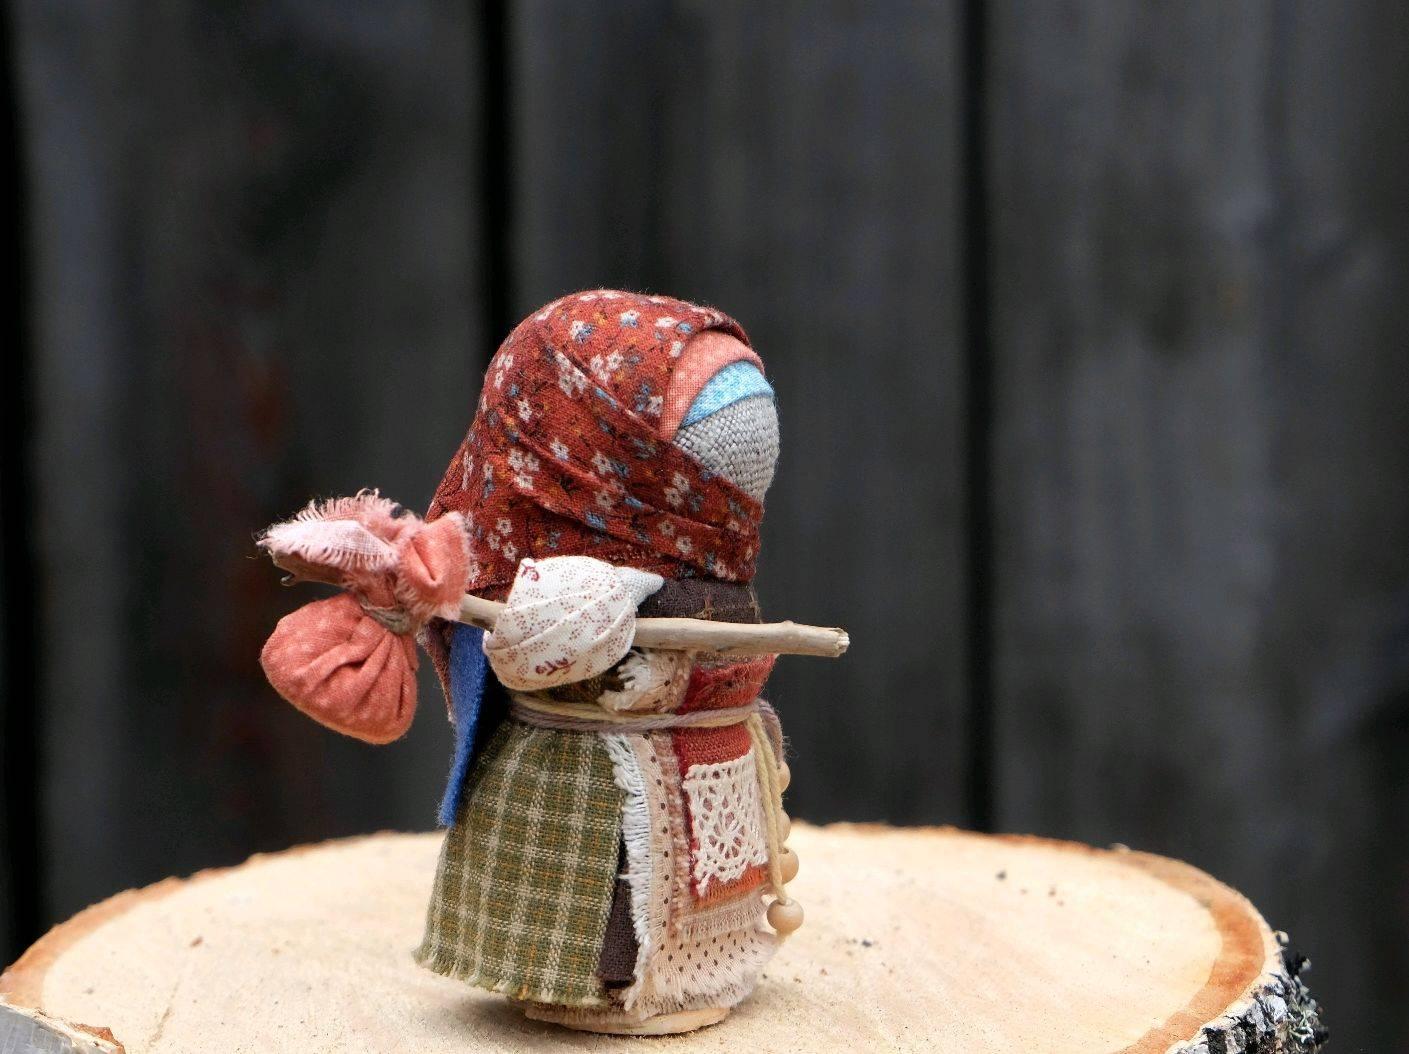 Кукла пеленашка своими руками. мастер класс по созданию оберега